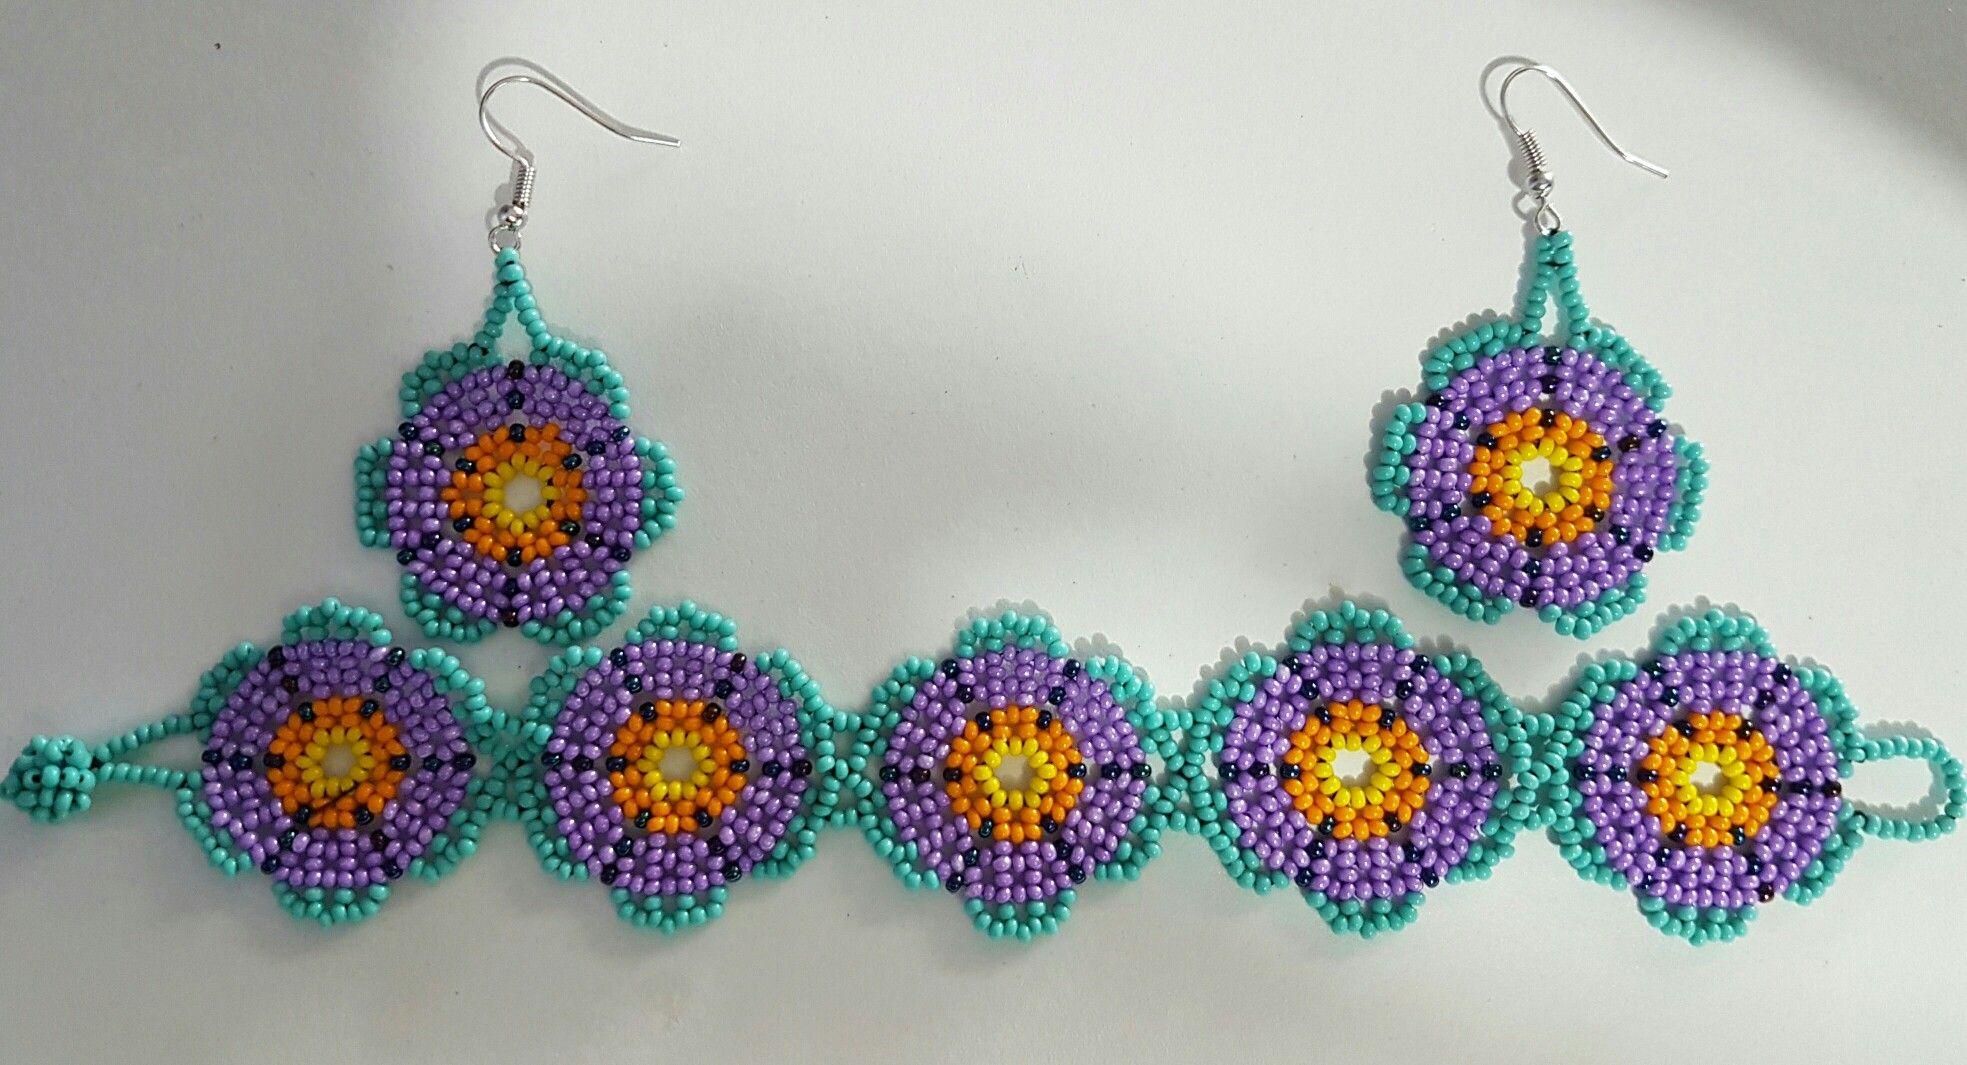 cac85a6aa67f Pulsera Flores Huichol chaquira Beads aretes turquesa